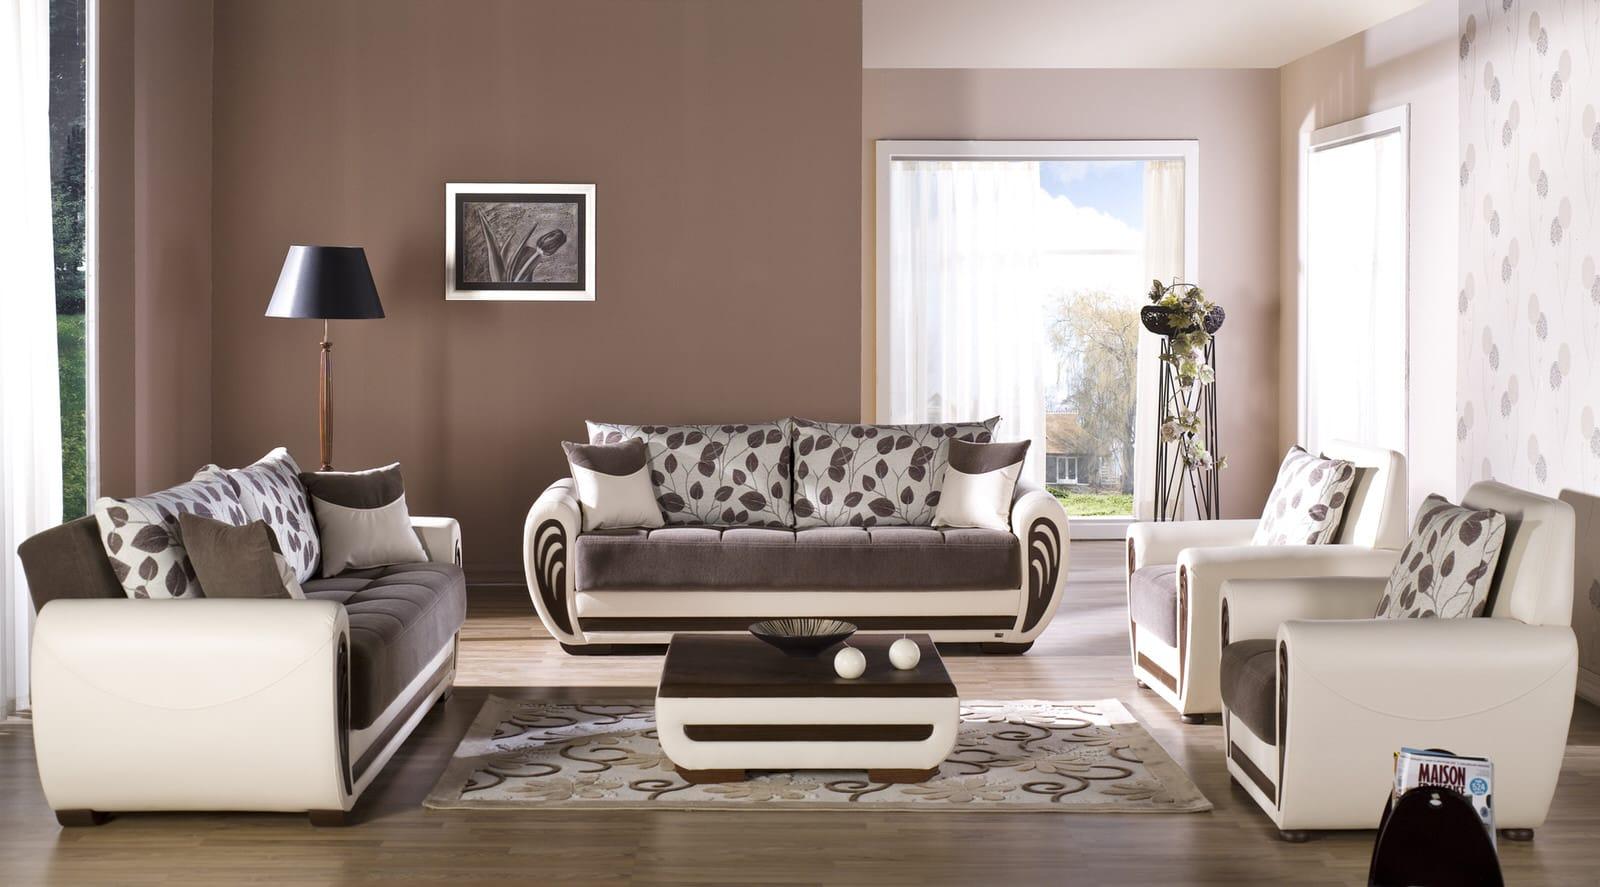 Marina Armoni Brown Sofa, Love & Chair Set by Istikbal Furniture